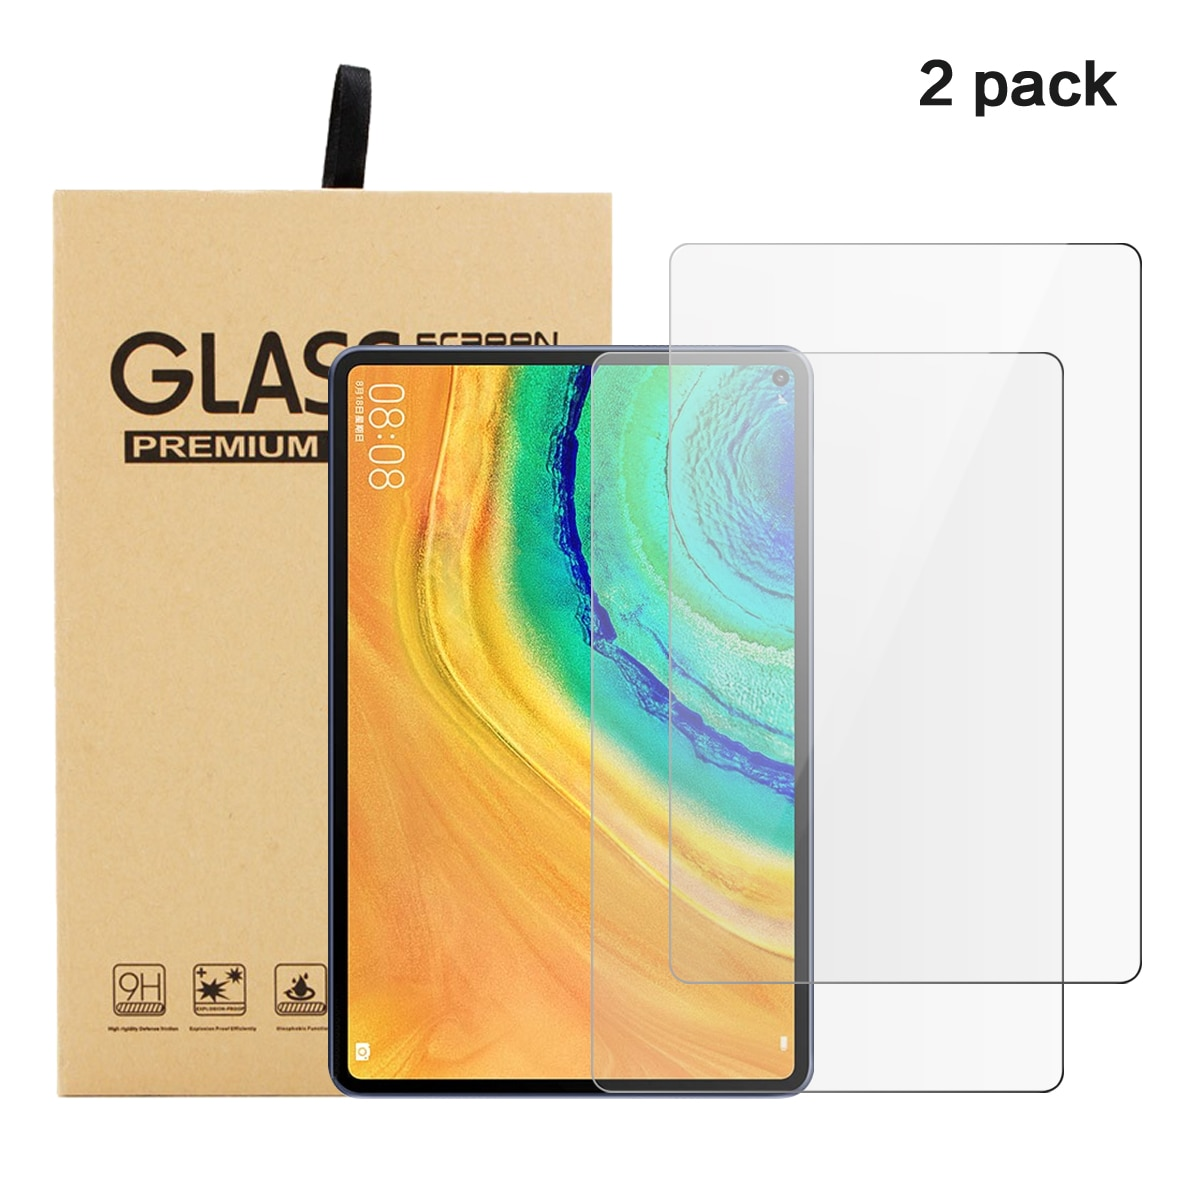 Película protetora para huawei matepad pro 10.8 5g 2020 portátil notebook protetor de tela para huawei matepad pro 10.8 tela vidro